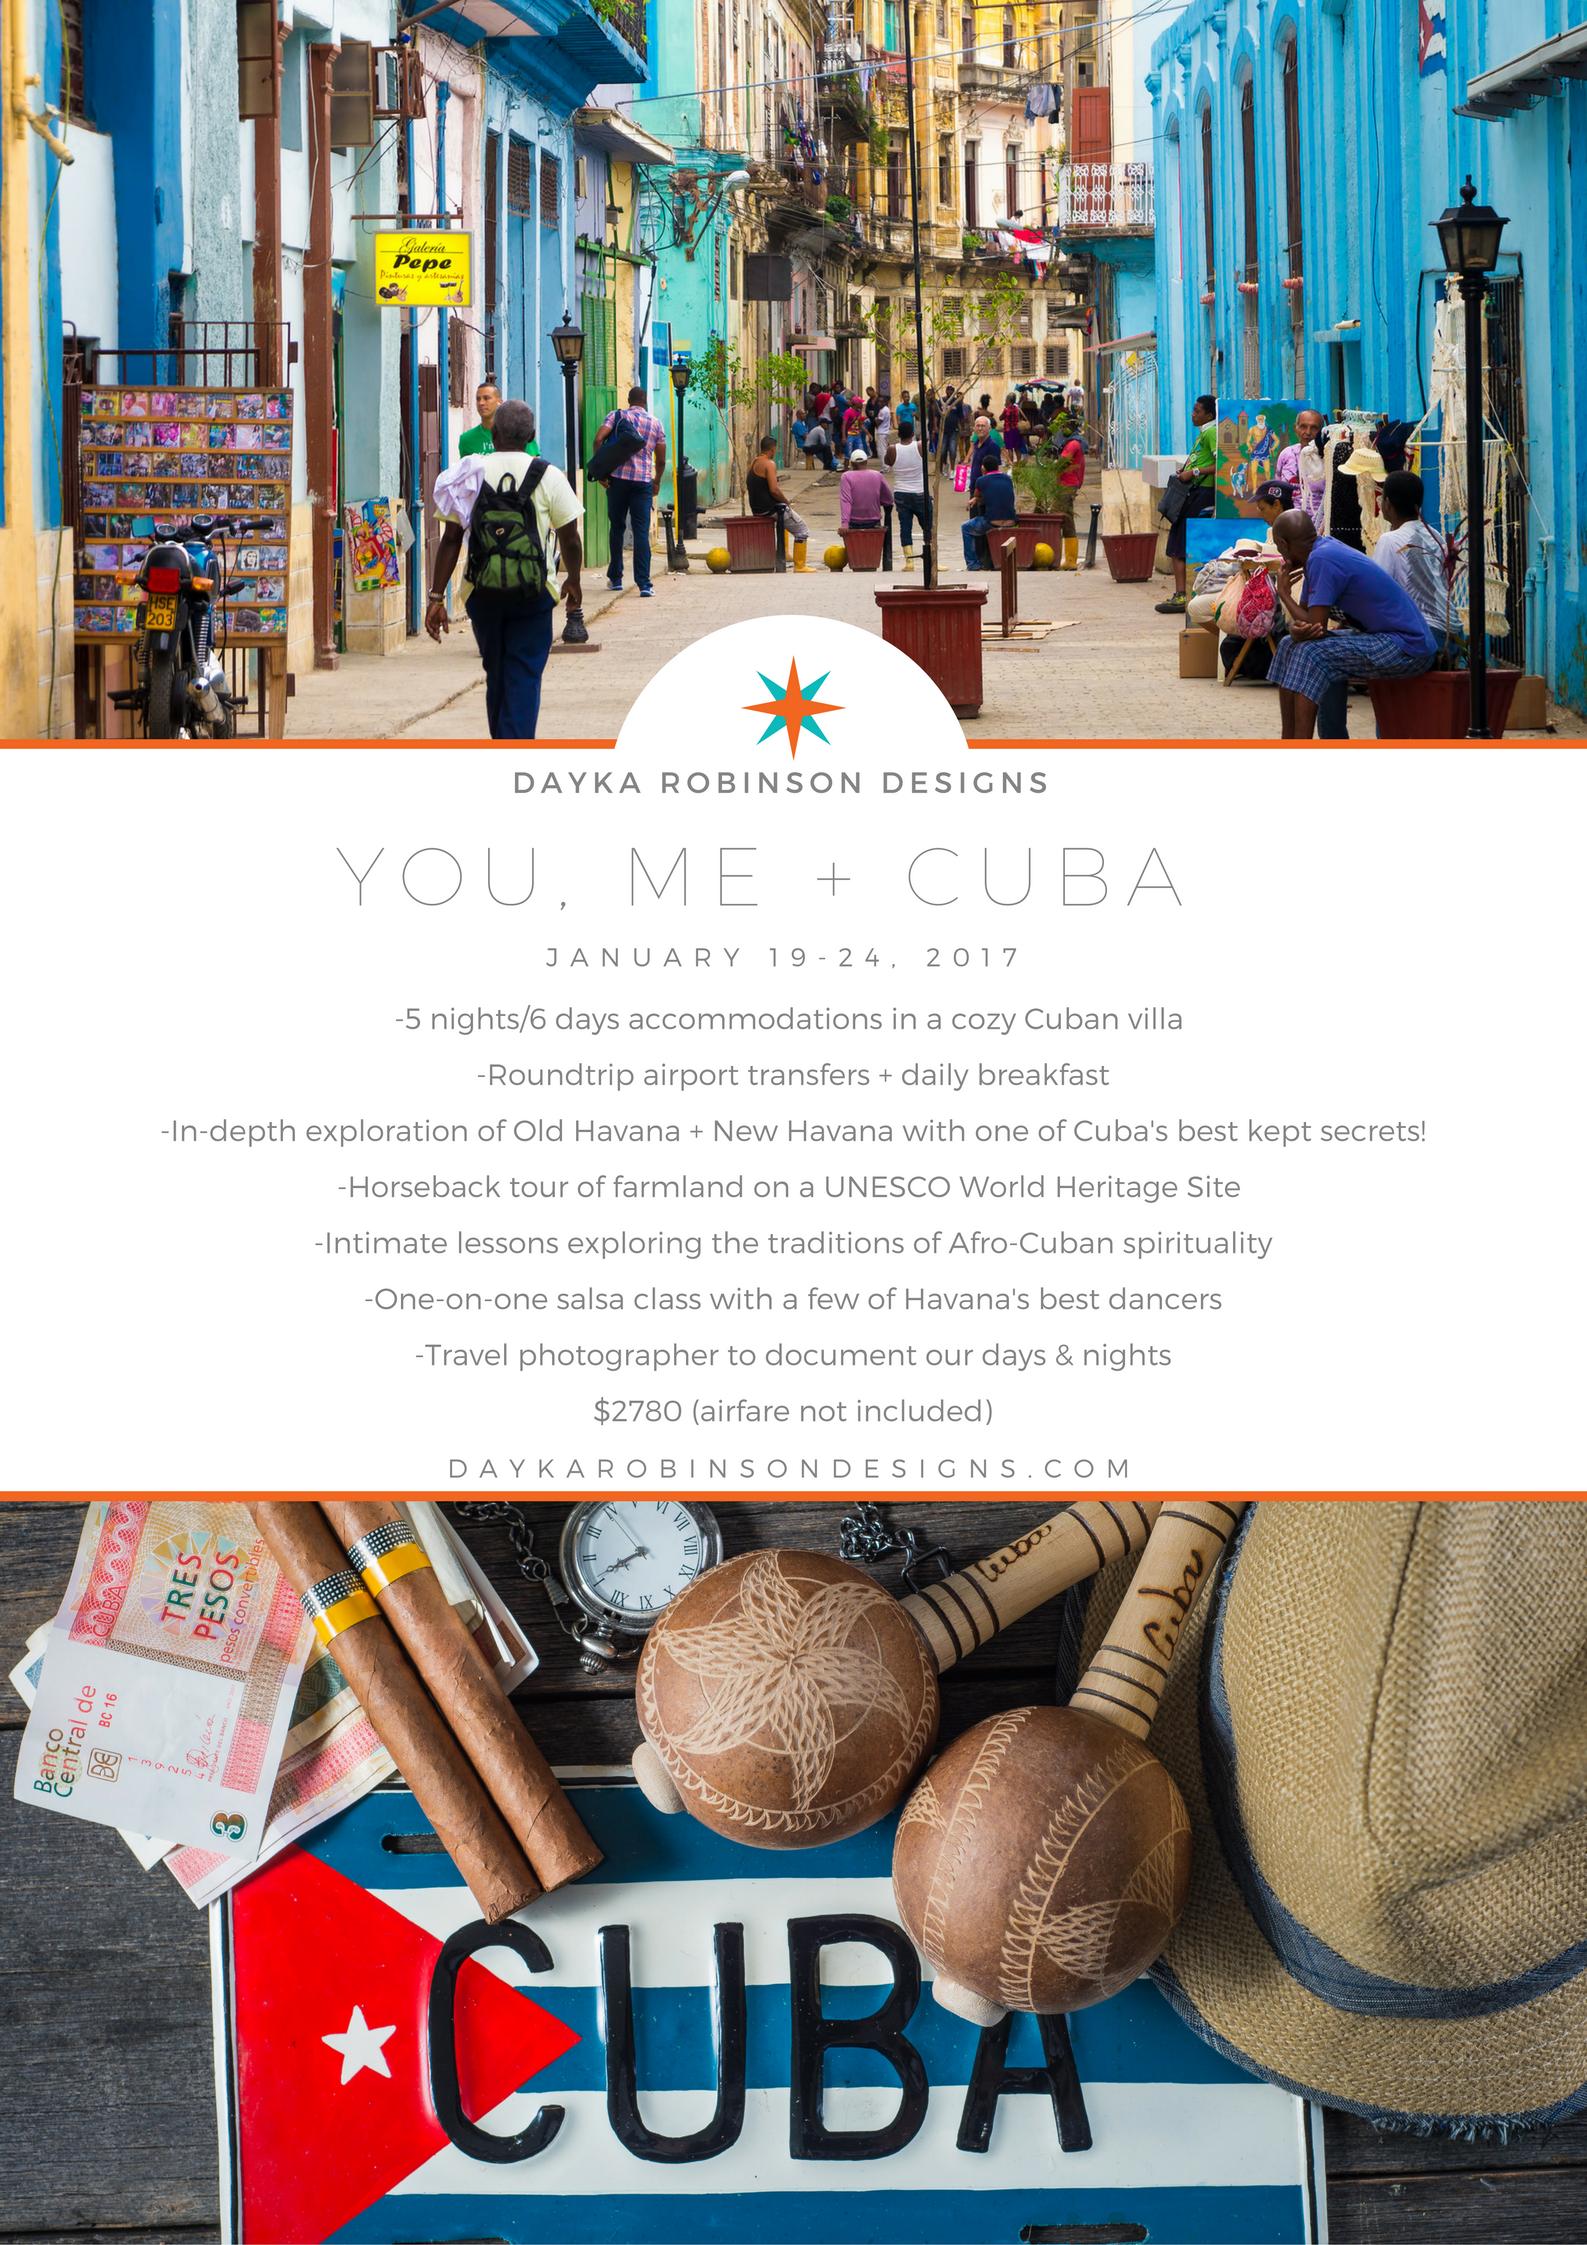 Dayka-Robinson-Designs-Cuba-2017.png